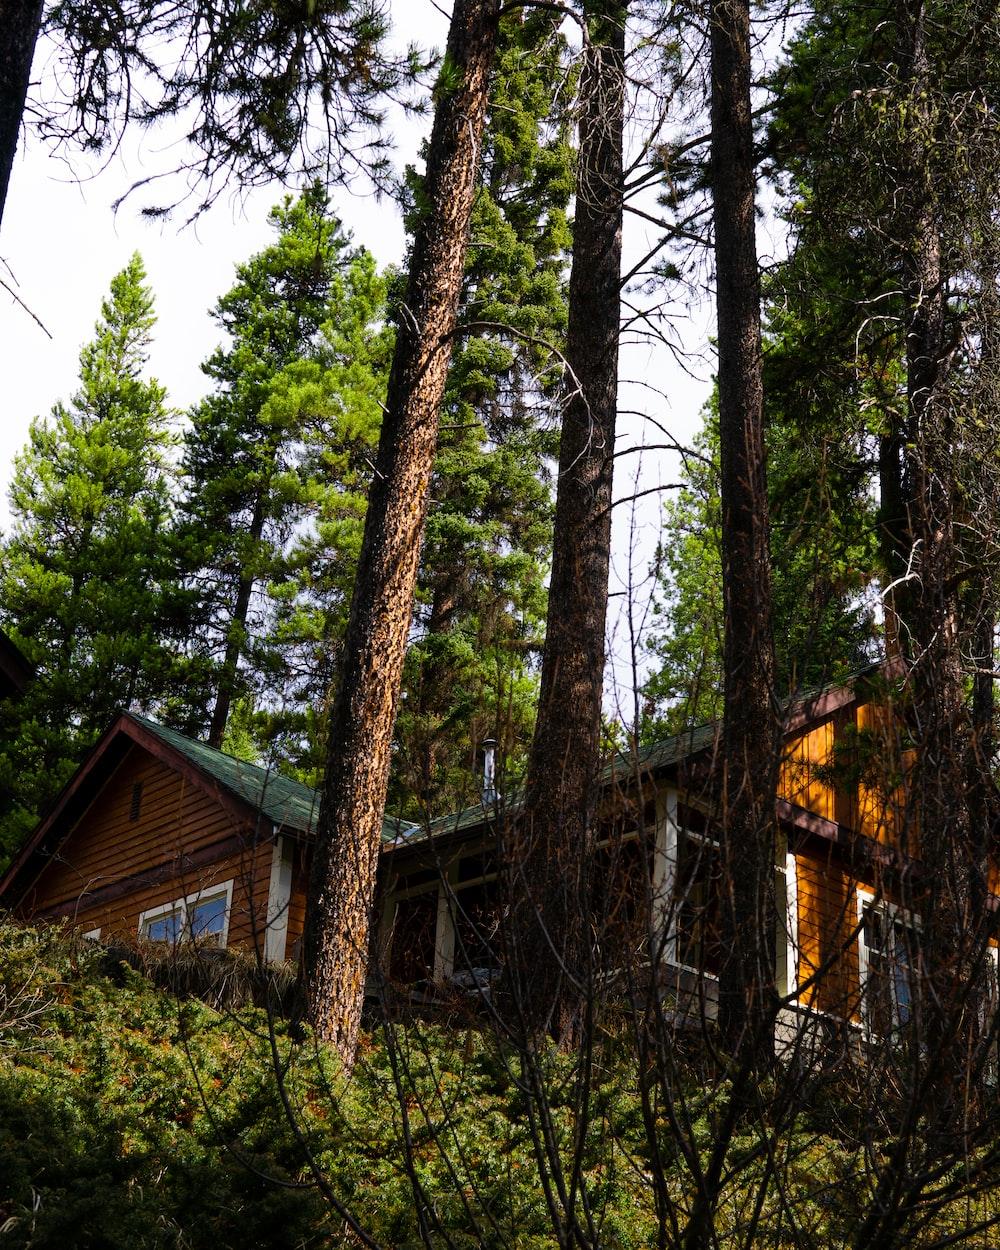 borwn house beside trees